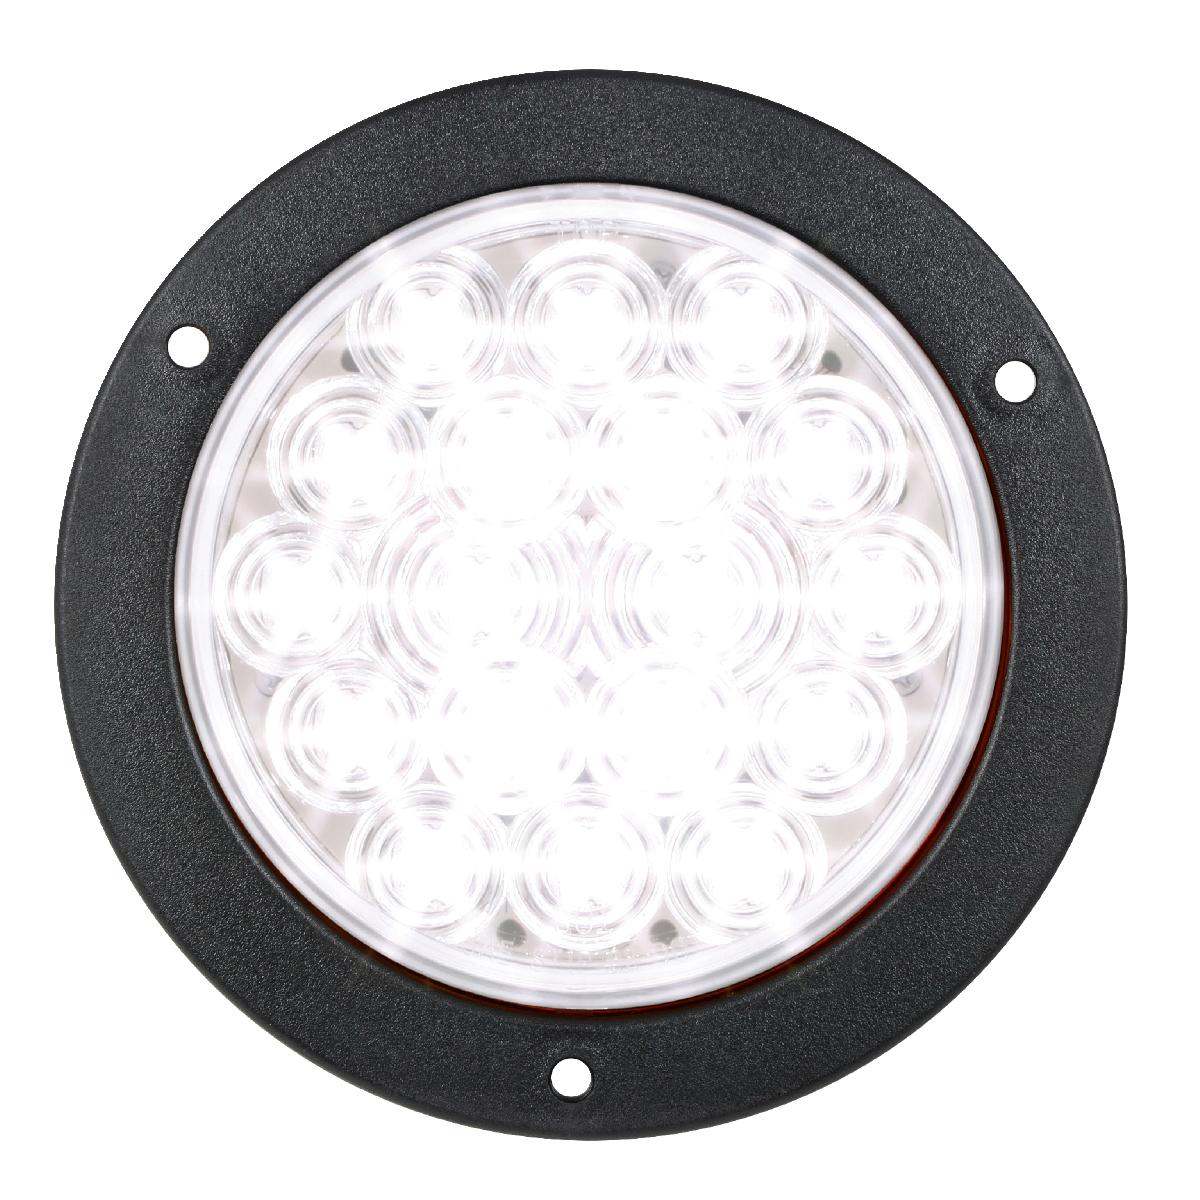 "75914 White/Clear 4"" Fleet LED Light with Black Flange Mount"